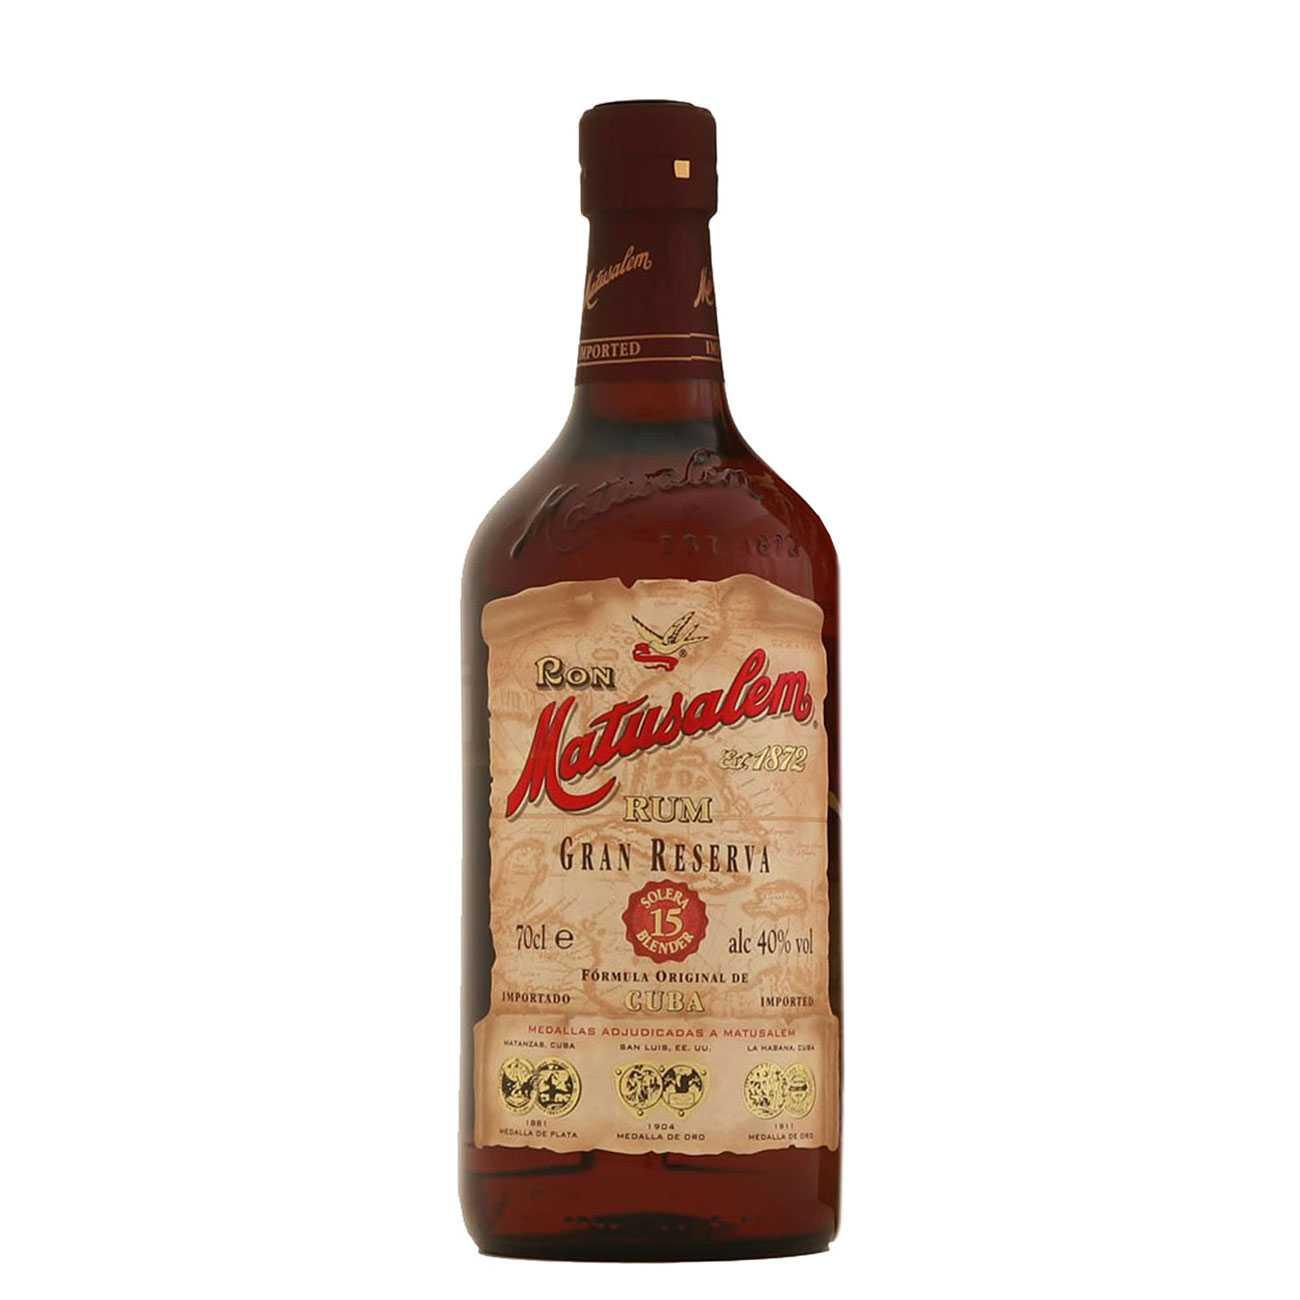 Rom, GRAN RESERVA 15Y 750 ML, Matusalem Rum